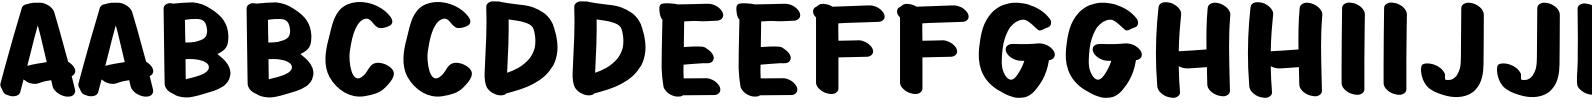 Fiest Font Duo